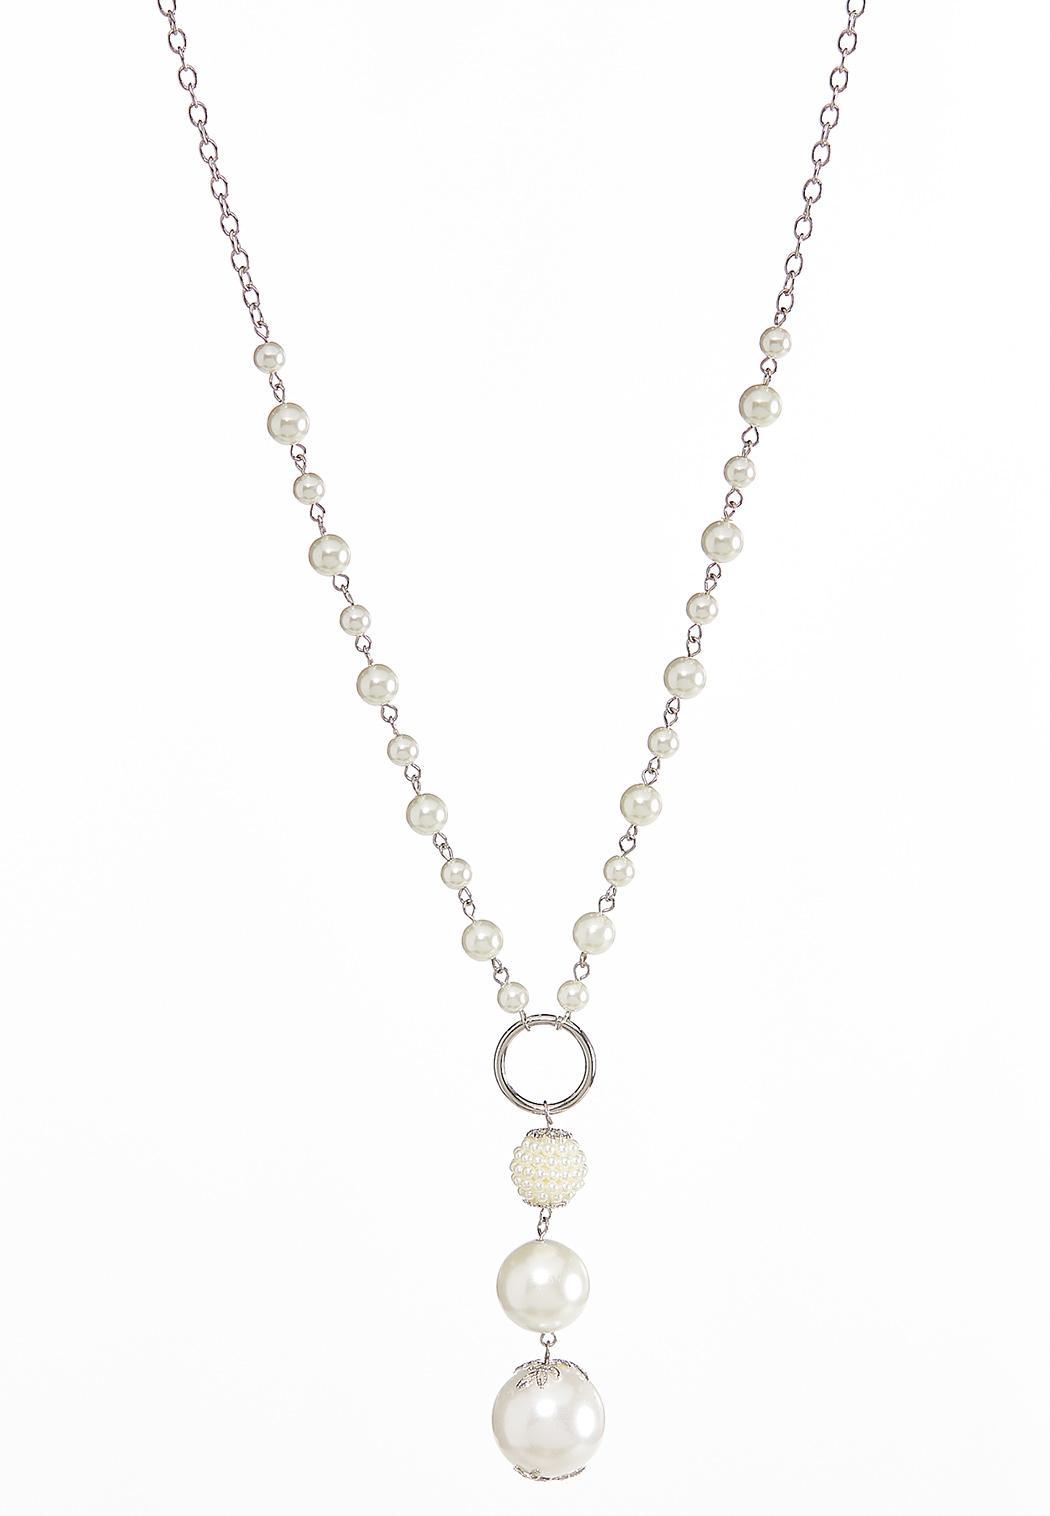 Graduated Pearl Pendant Necklace